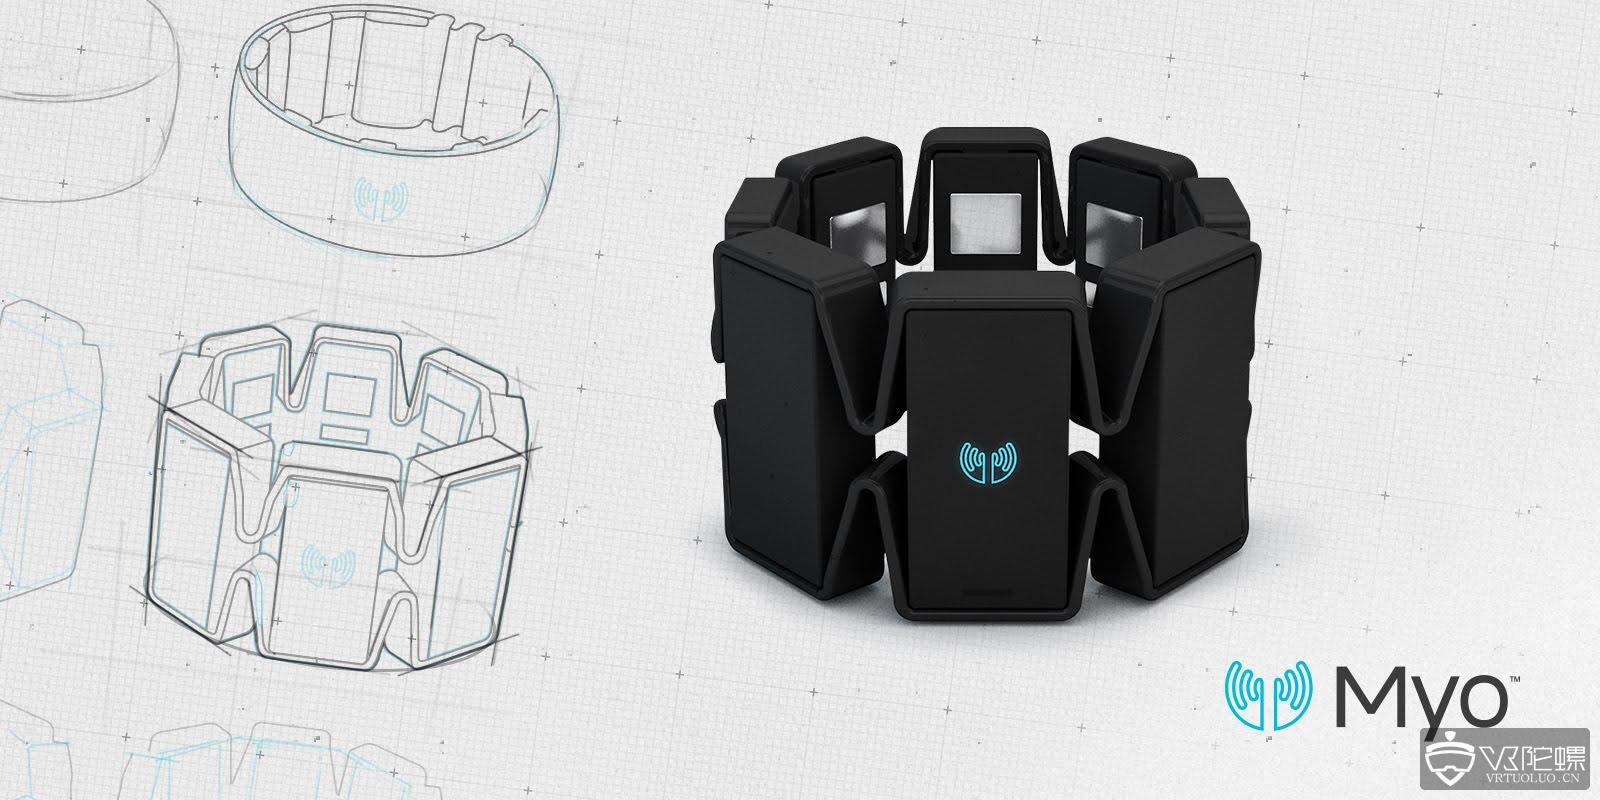 Thalmic设备穿戴公司宣布终止手势控制臂环Myo项目